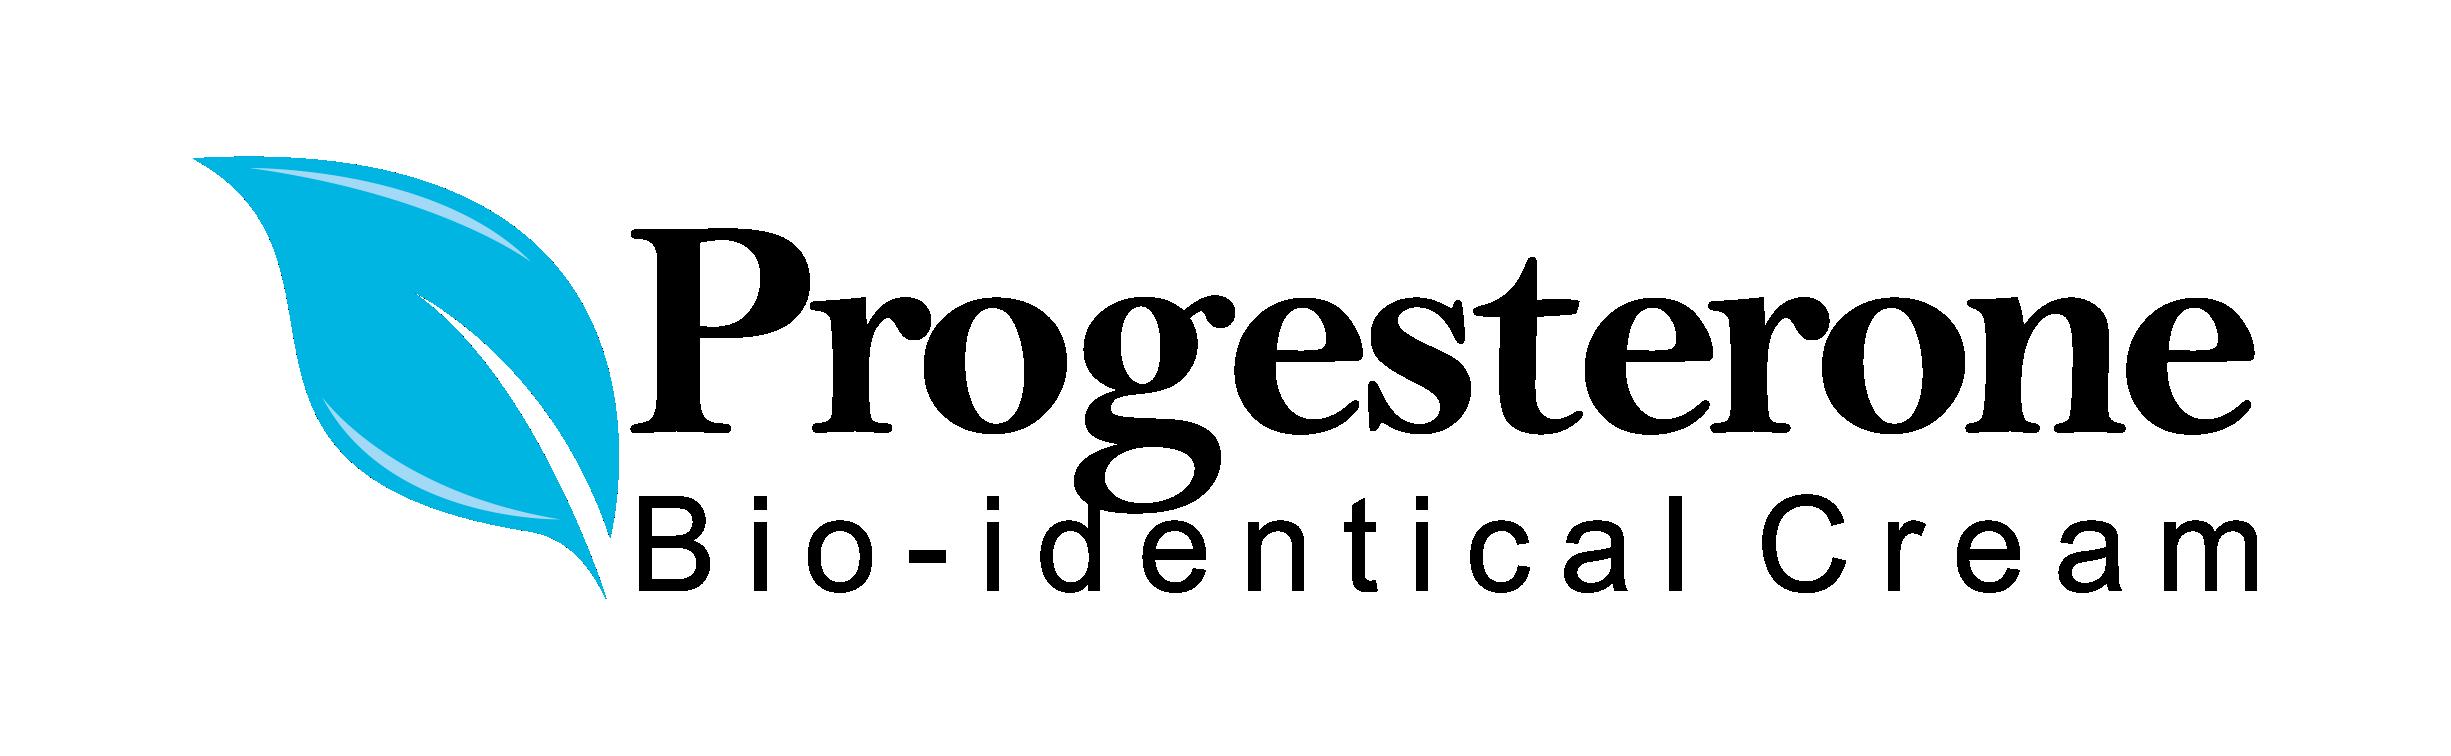 Natpro progesterone